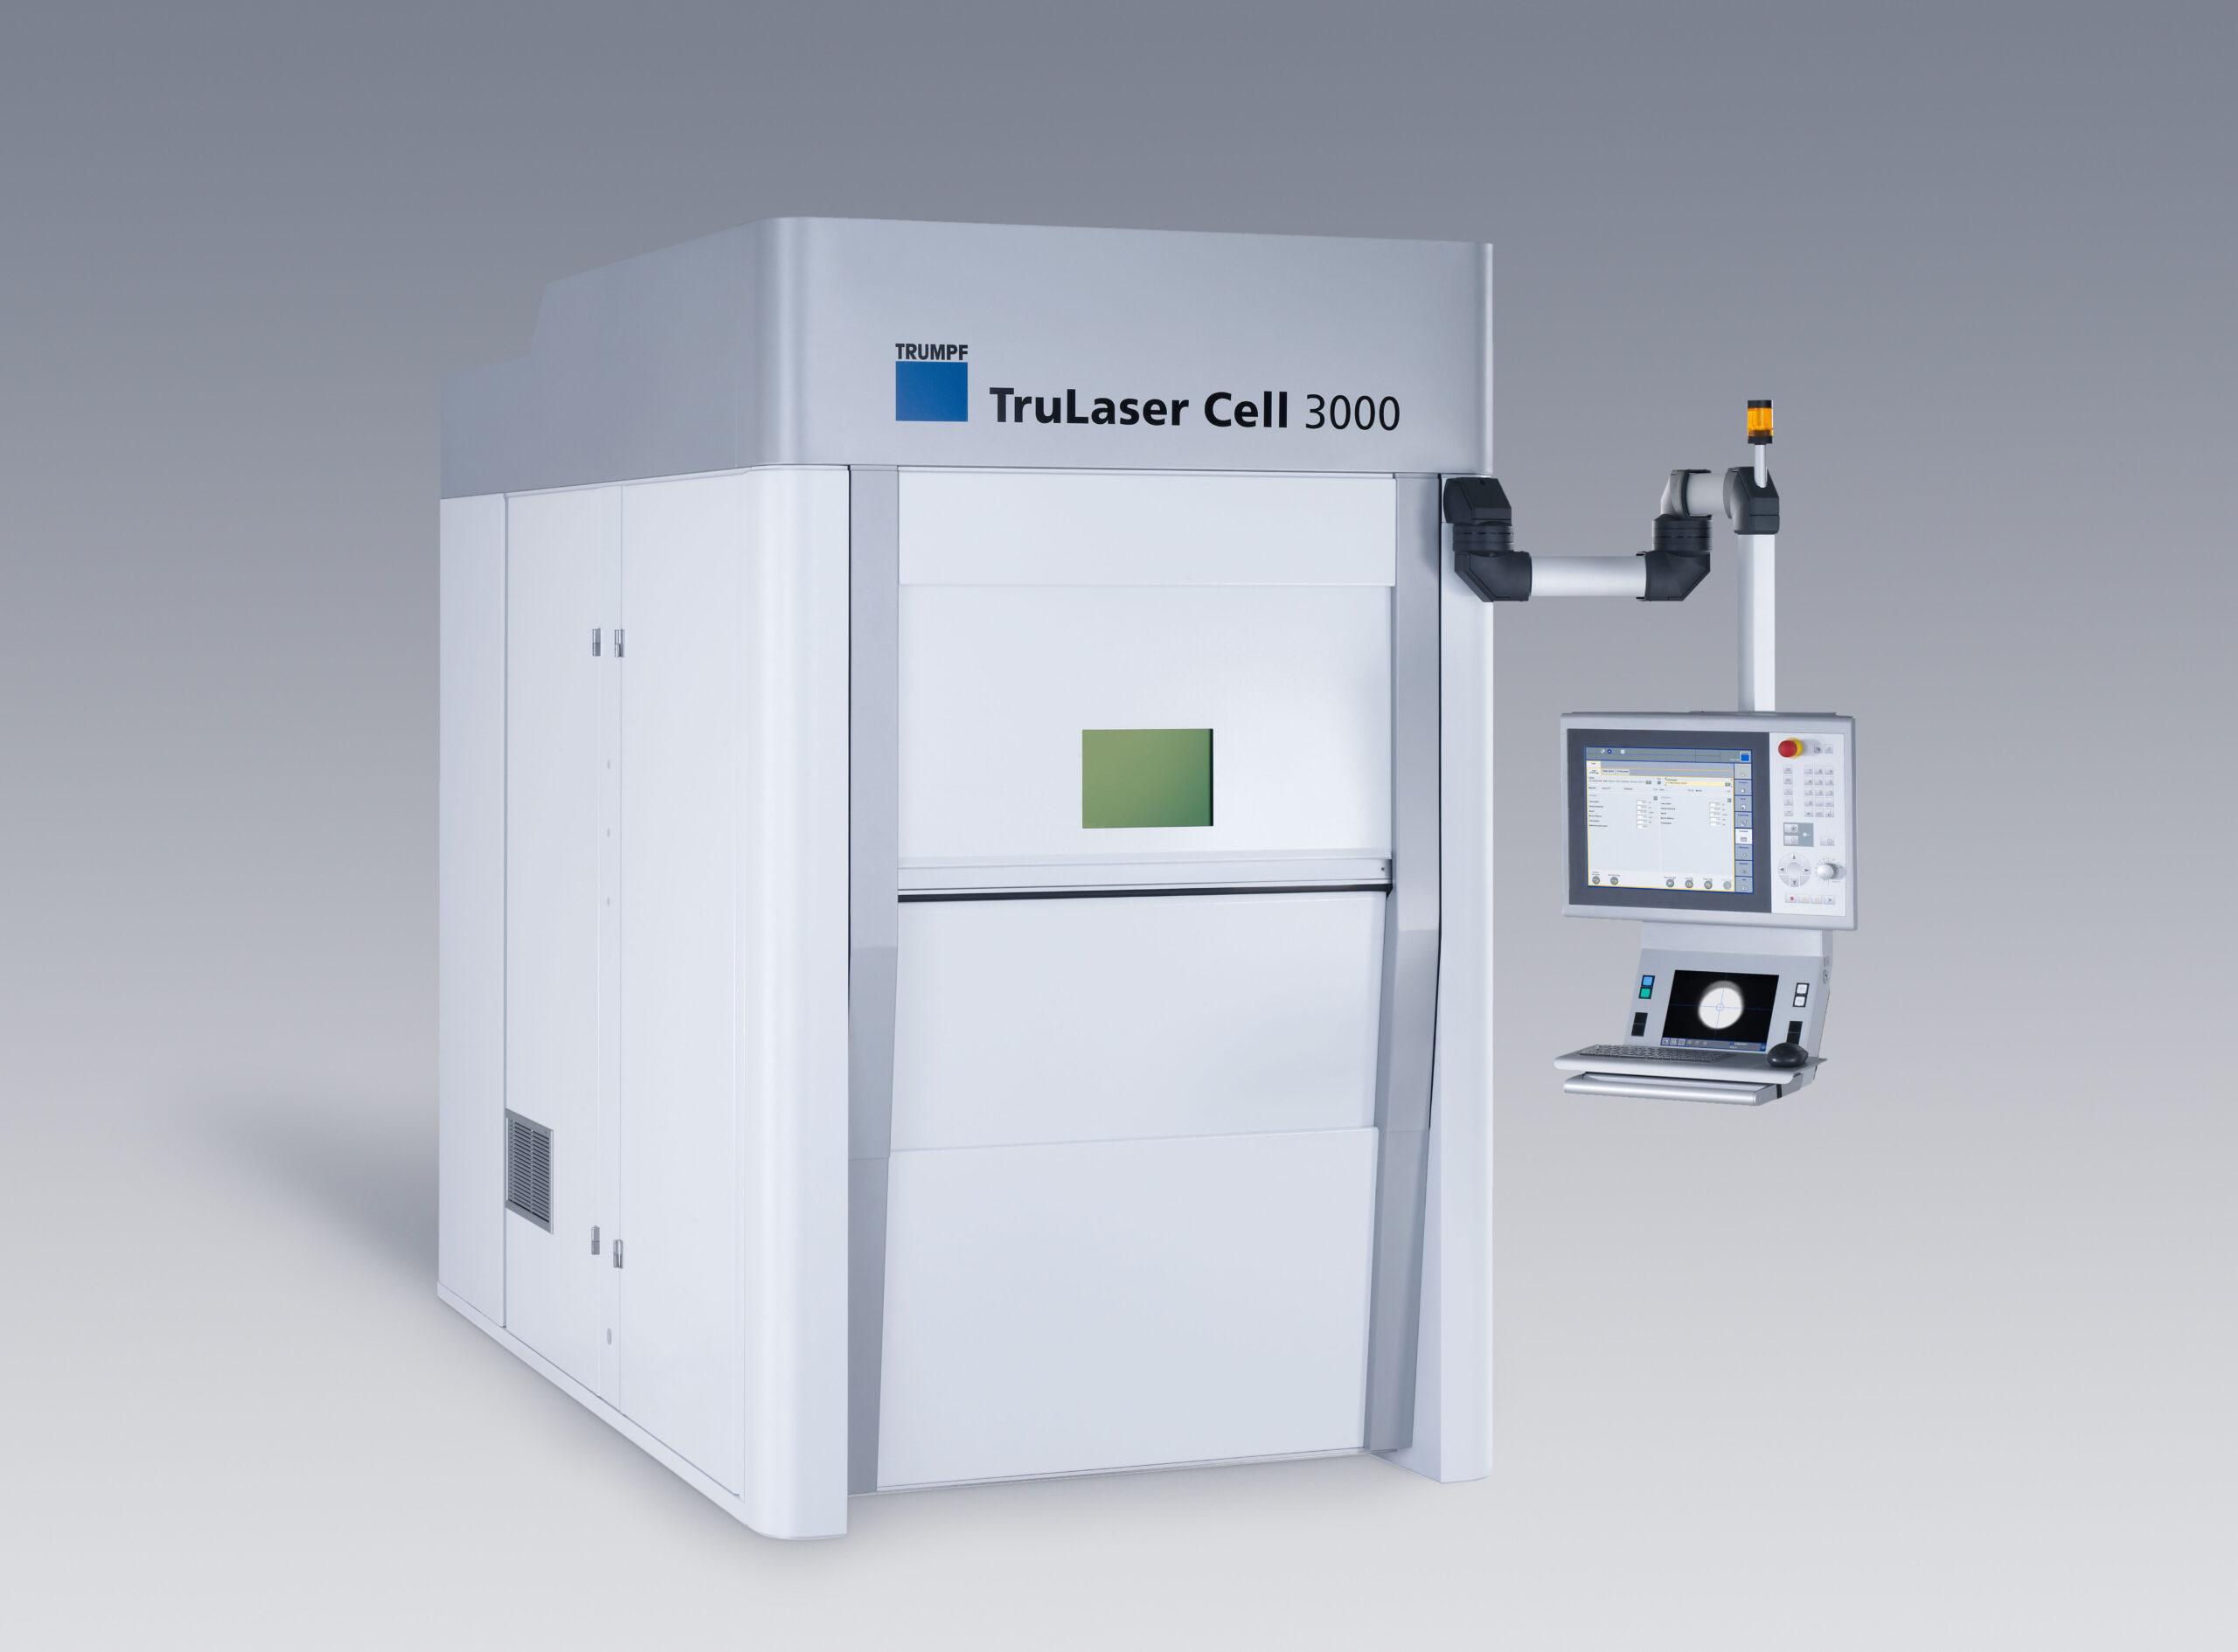 Trumpf TruLaser Cell 3000 BLS Lasertechnology